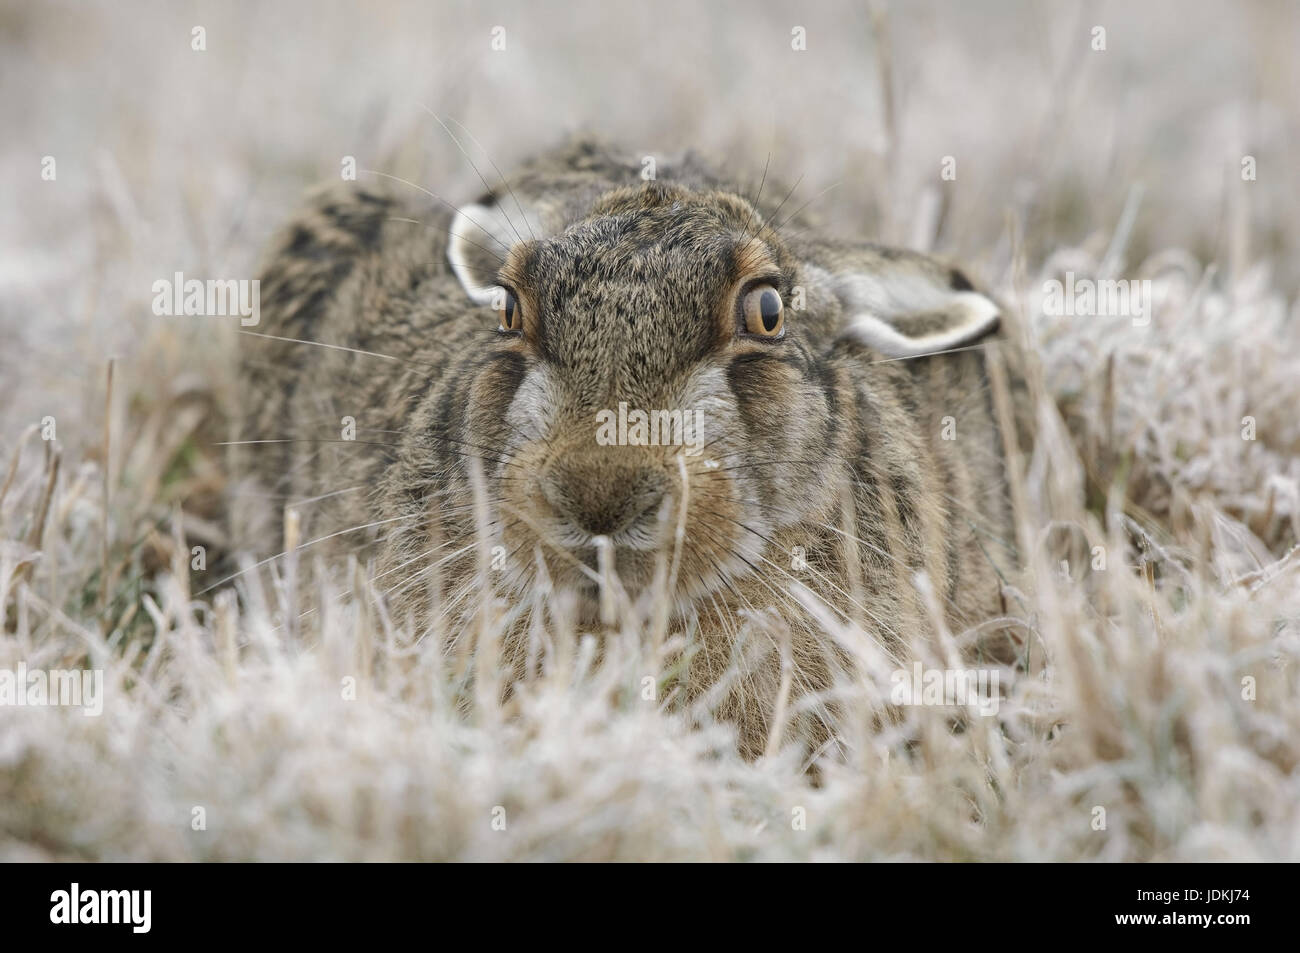 Feld-Hase, Lepus Europaeus, Feldhase, Feld-Hase mit Rauhreif auf dem Rasen verbirgt Feldhase, Feldhasen, Feldhase Stockbild